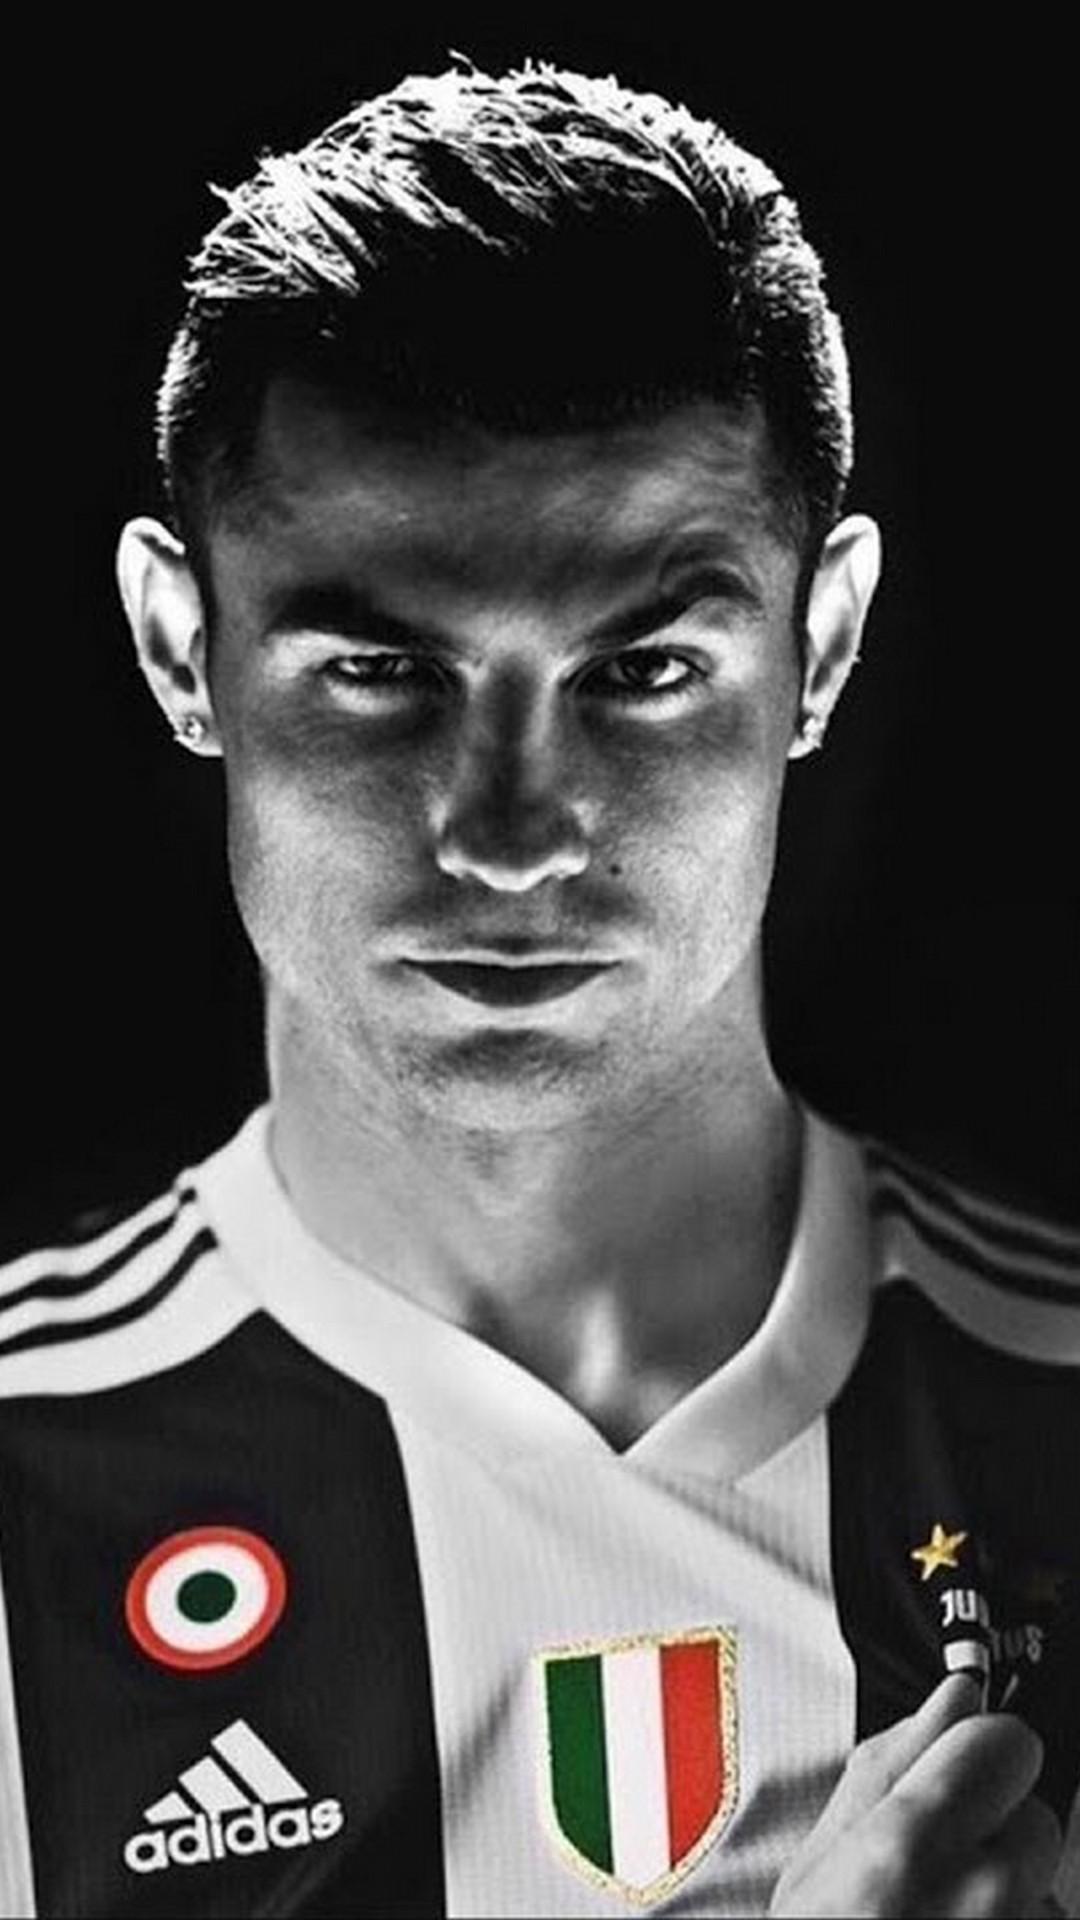 C Ronaldo Juventus Wallpaper iPhone 2019 3D iPhone Wallpaper 1080x1920